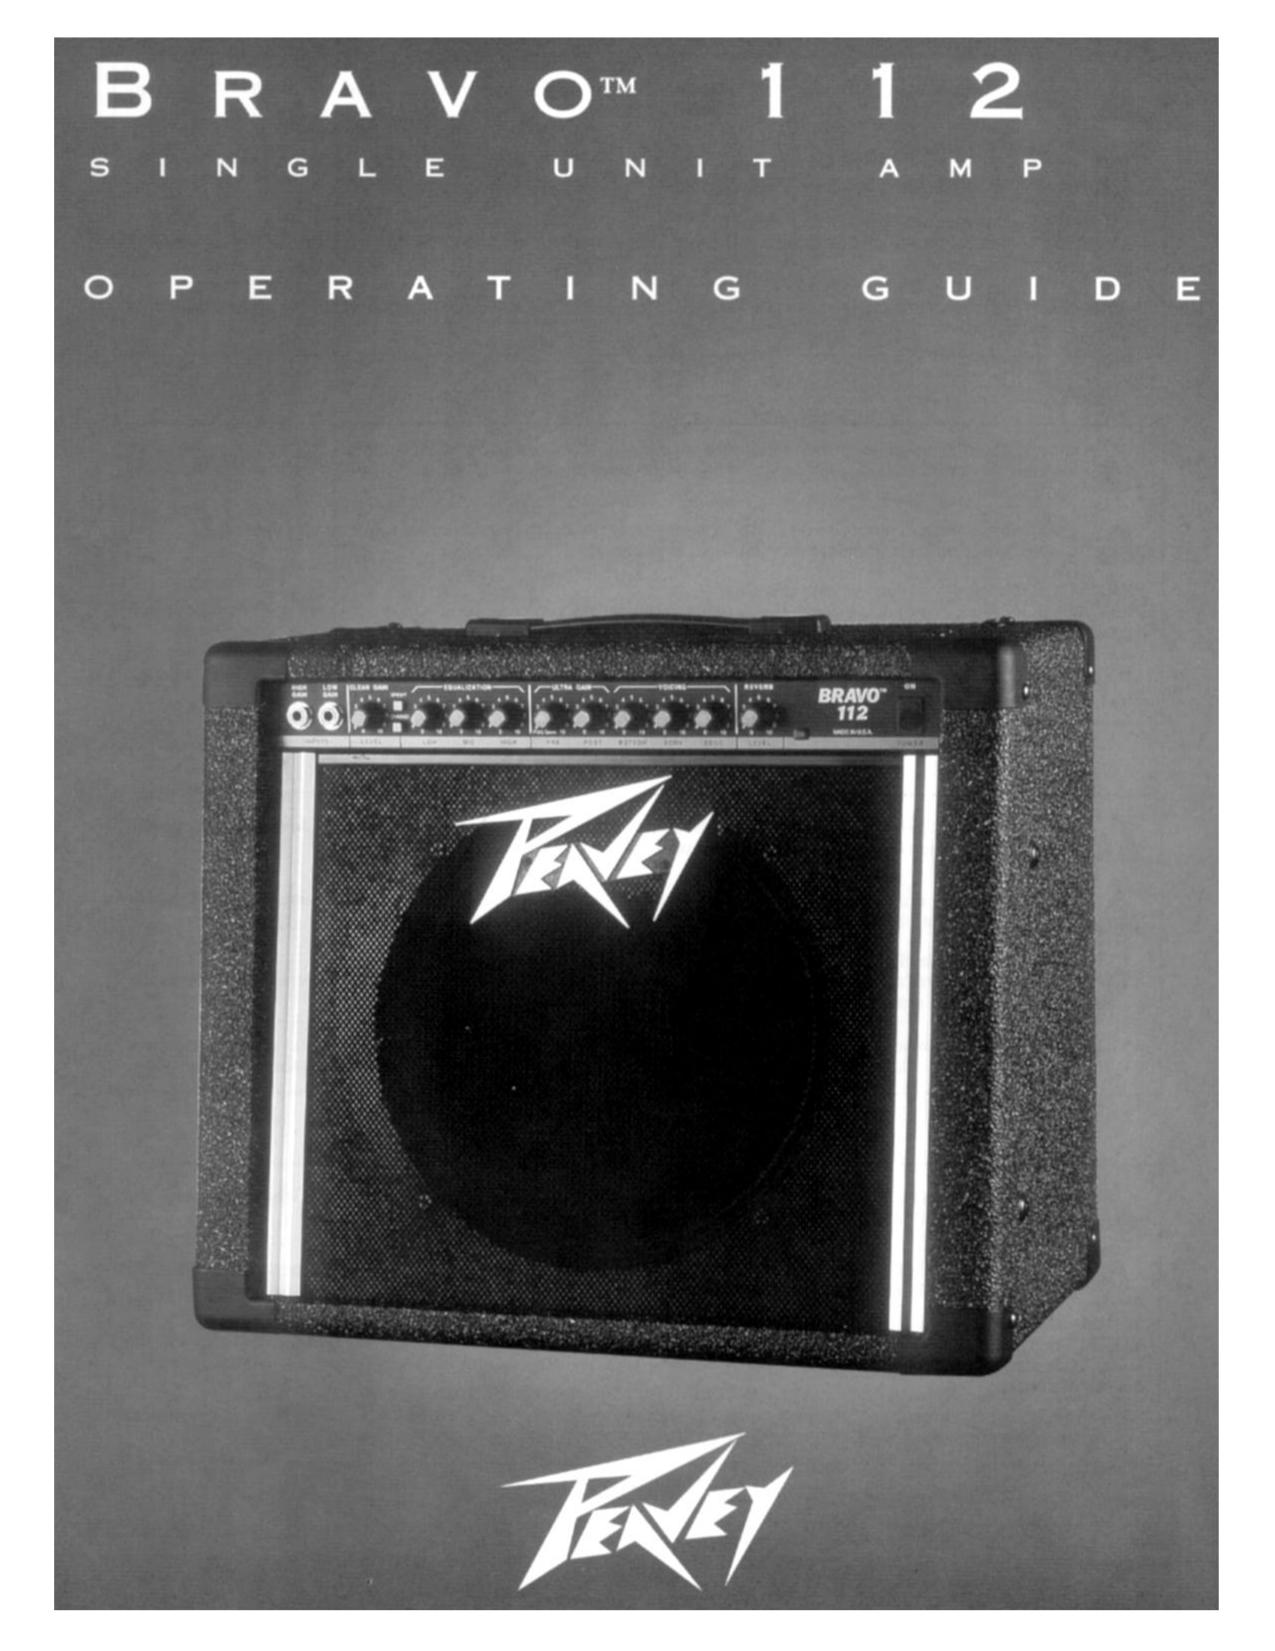 Download free pdf for Peavey Bravo 112 Amp manual